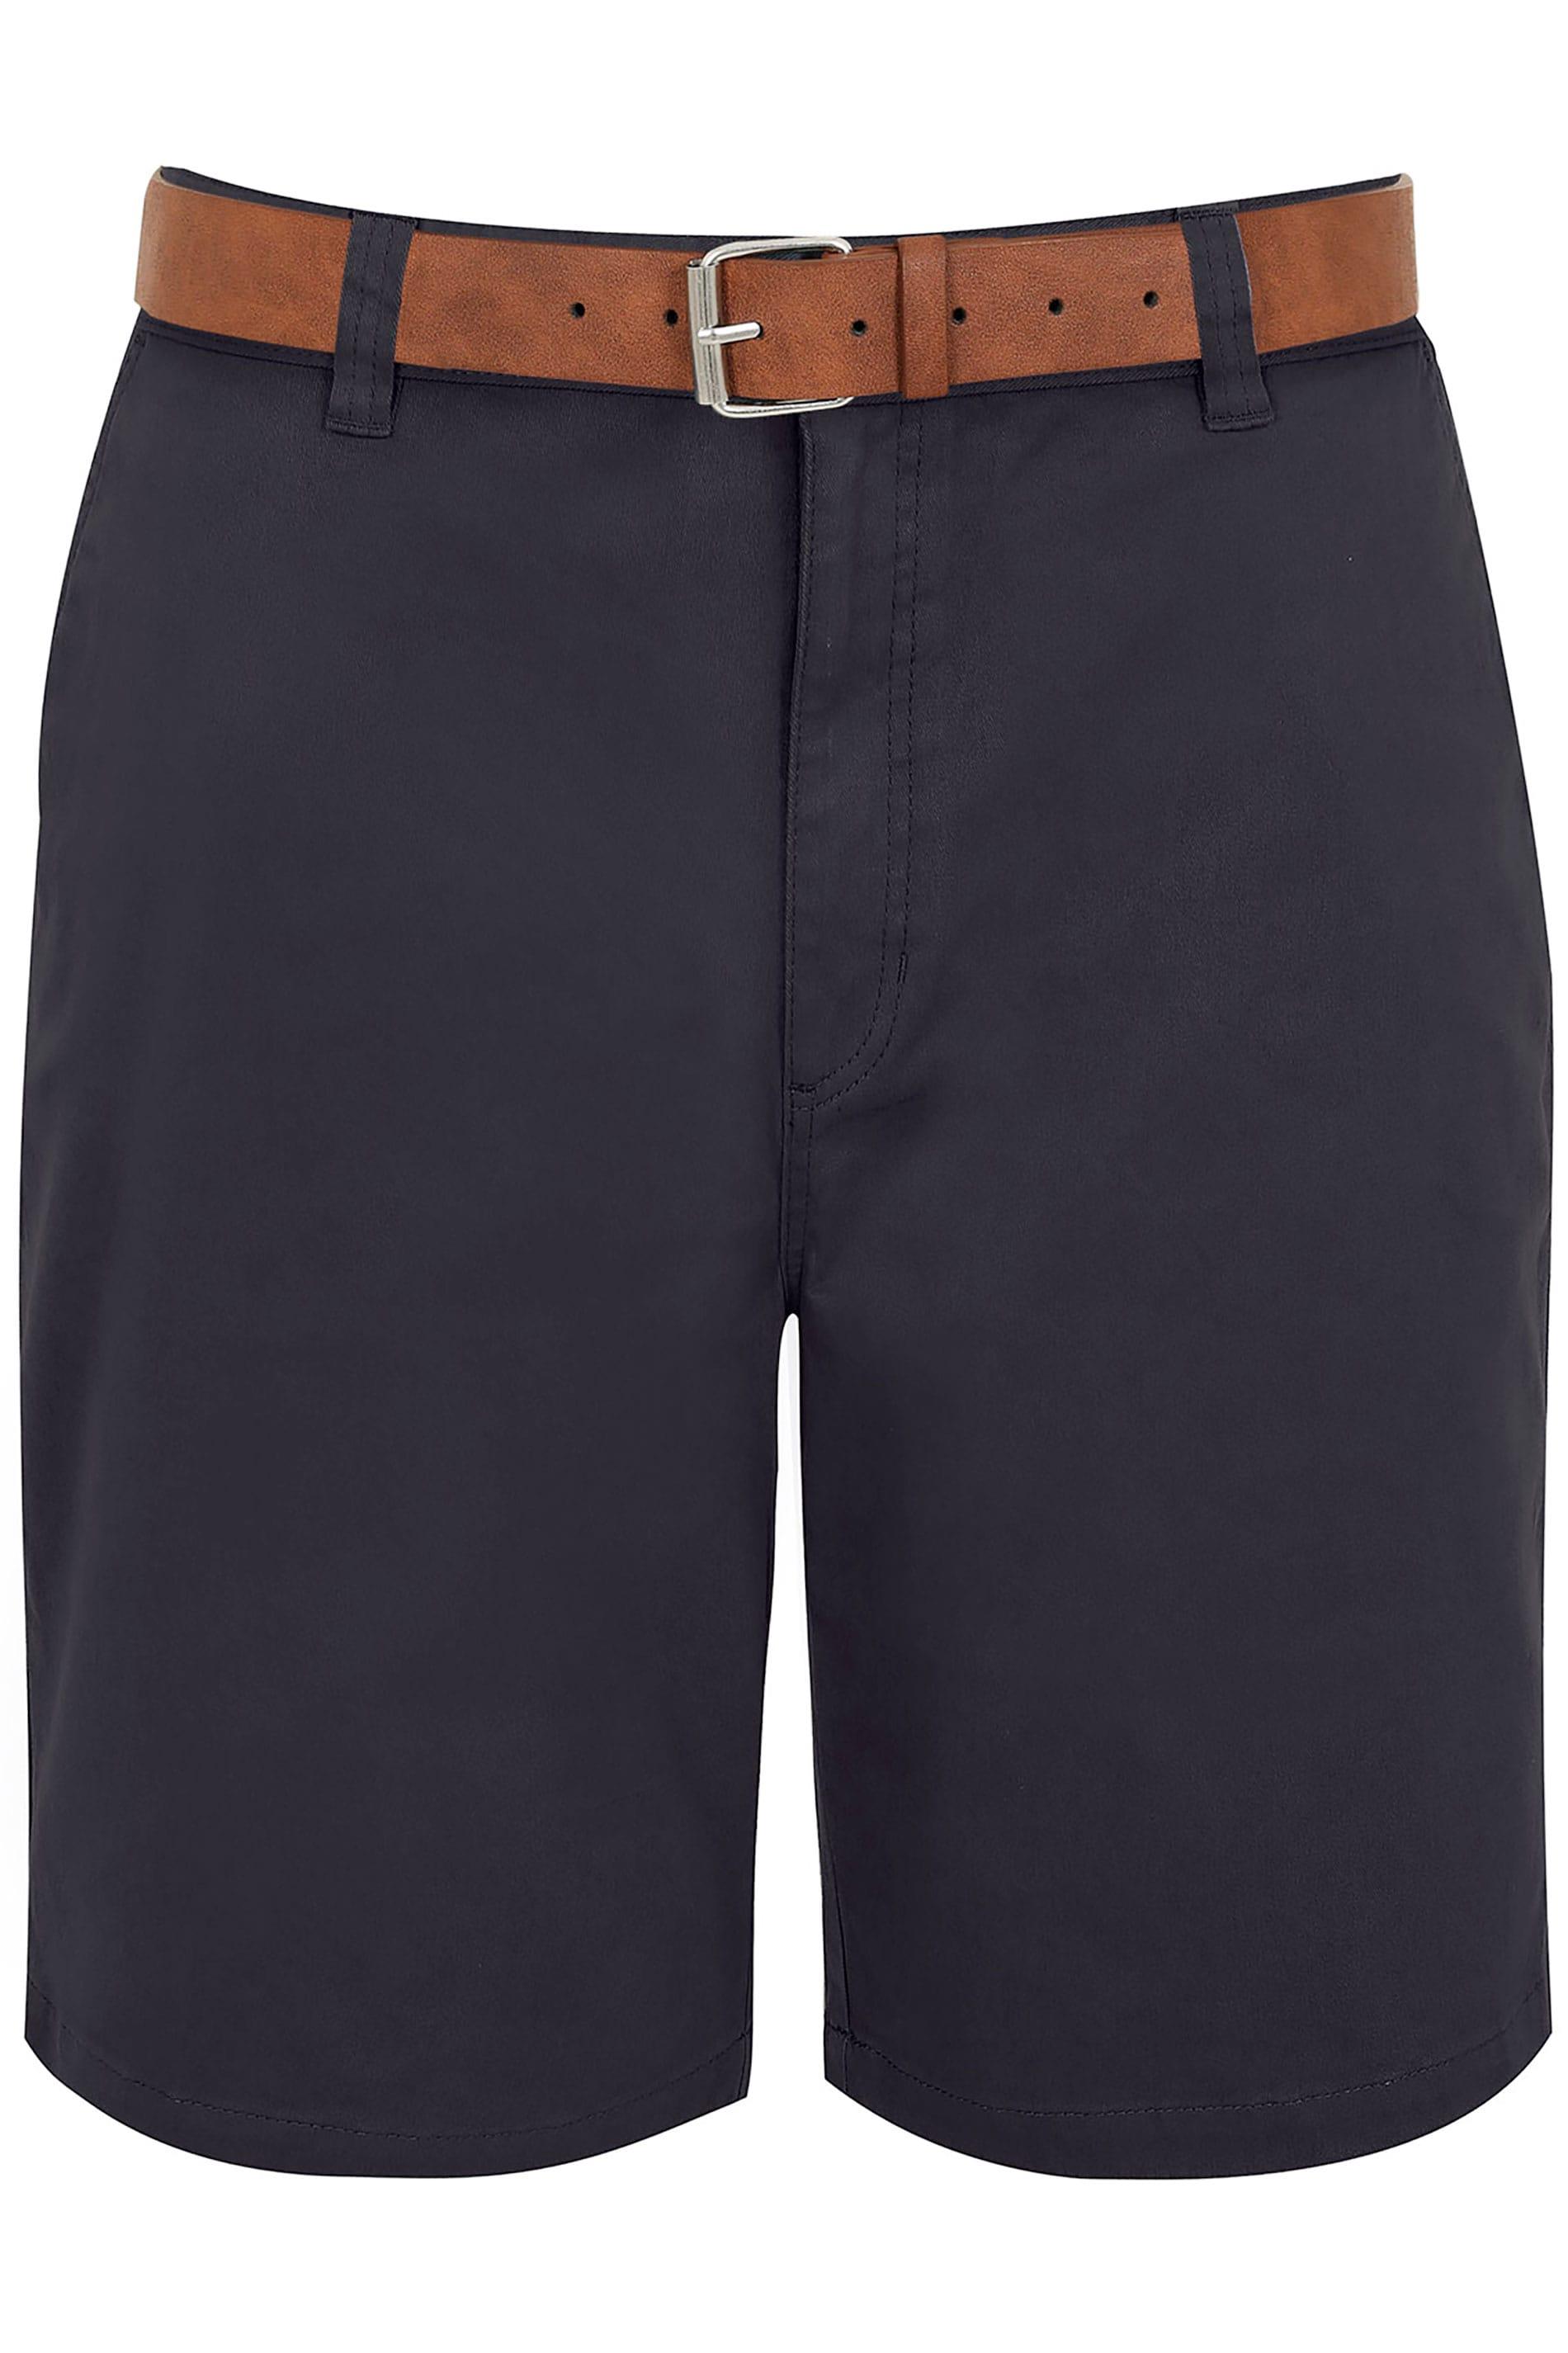 BadRhino Navy Five Pocket Chino Shorts With Belt